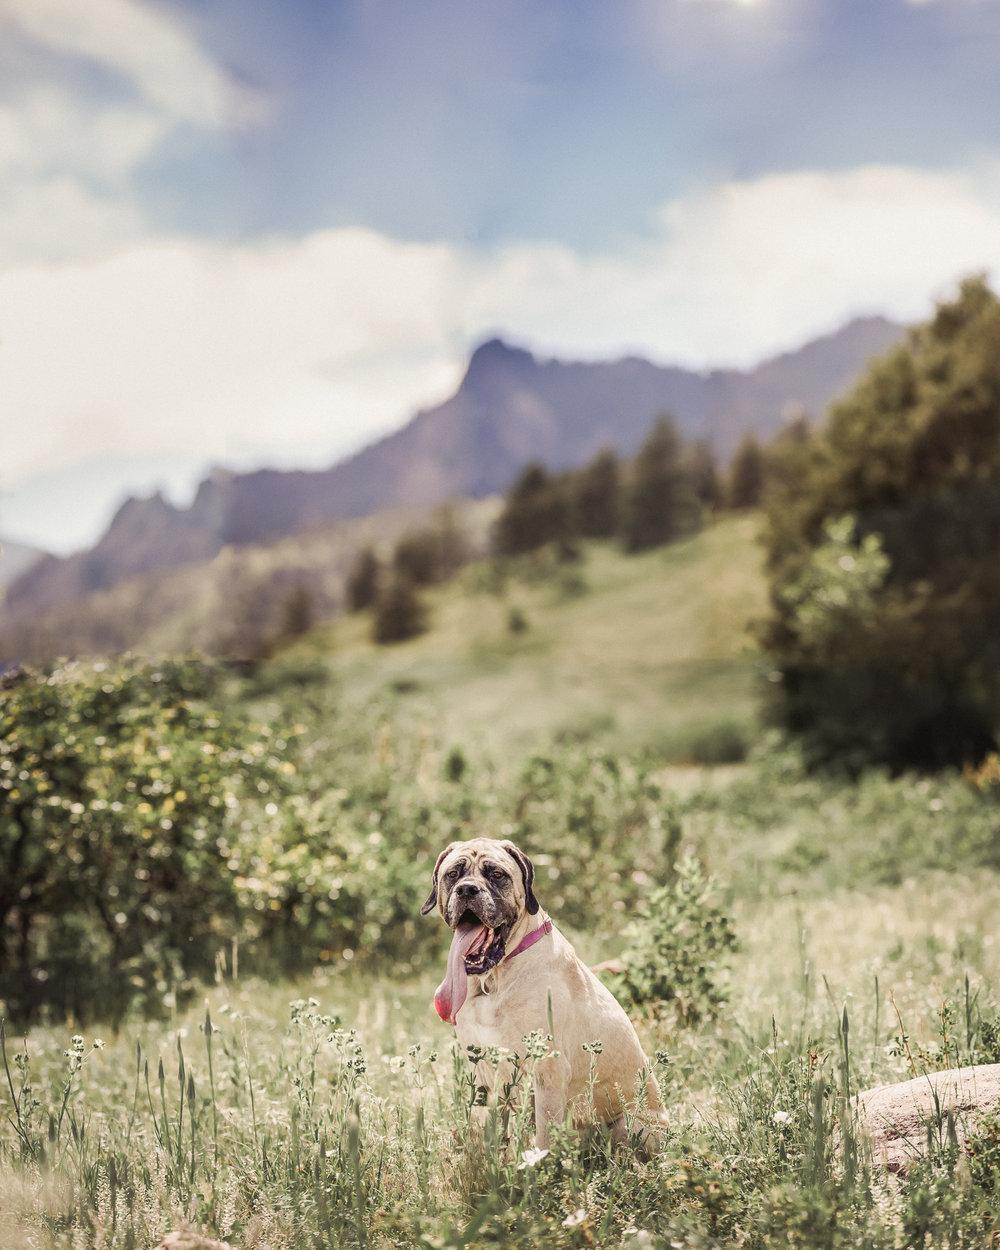 Wes-Ryan-Dog-Photography-IMG_4870-Pano-RT.jpg